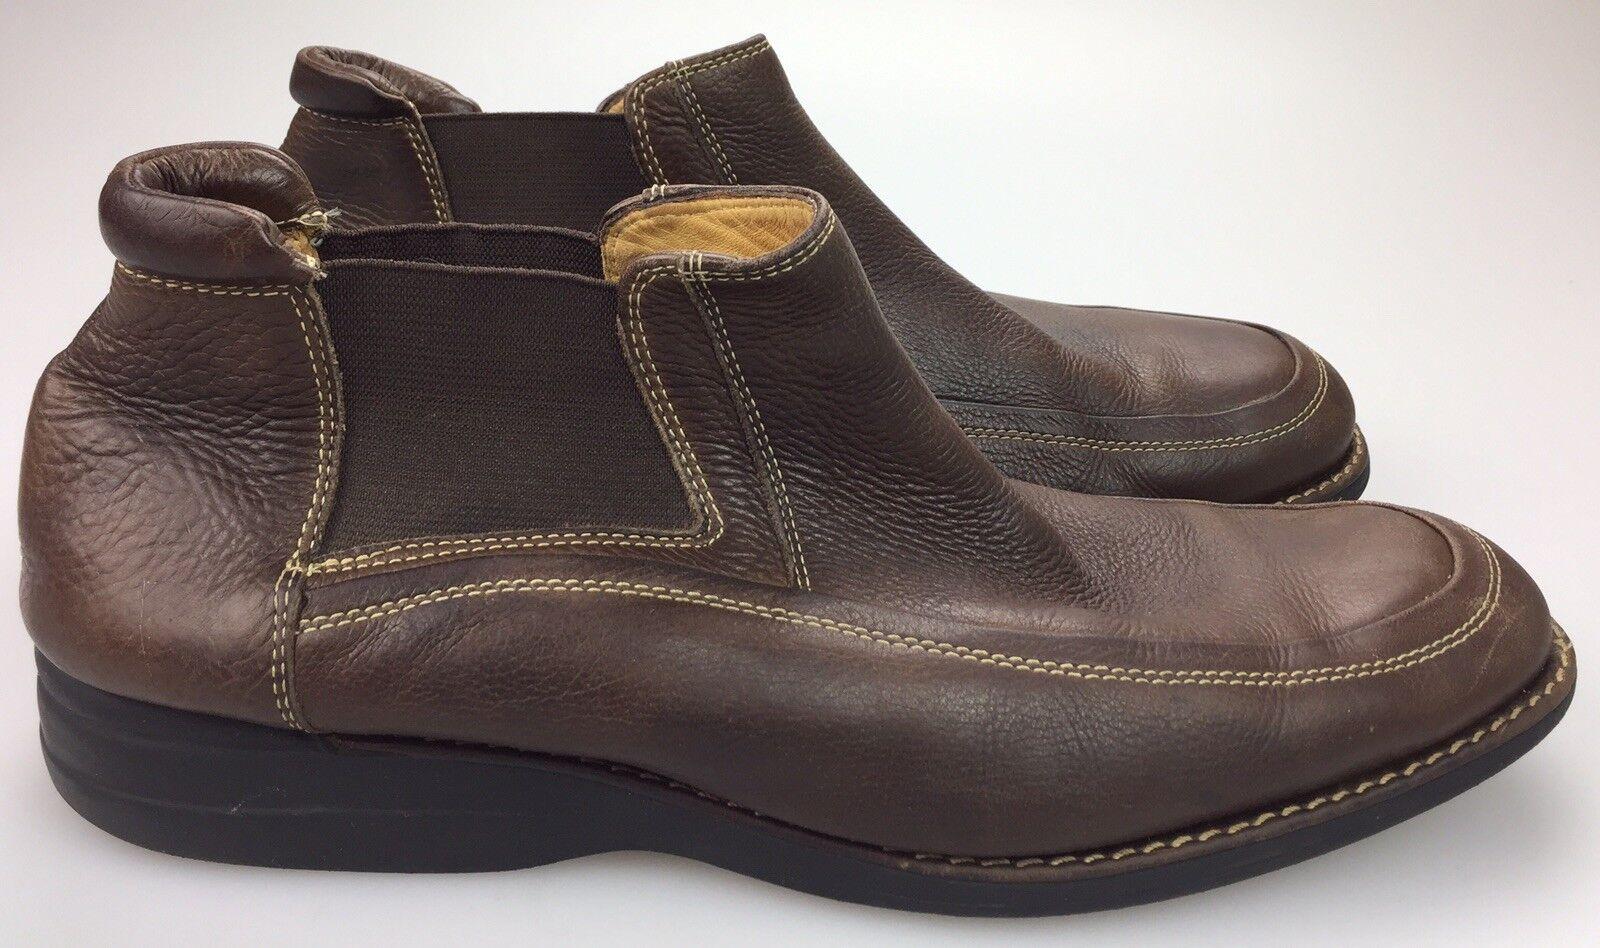 JOHNSTON & MURPHY Sheepskin Lined Soft Leather Chelsea Boots - Men's Size 13 M